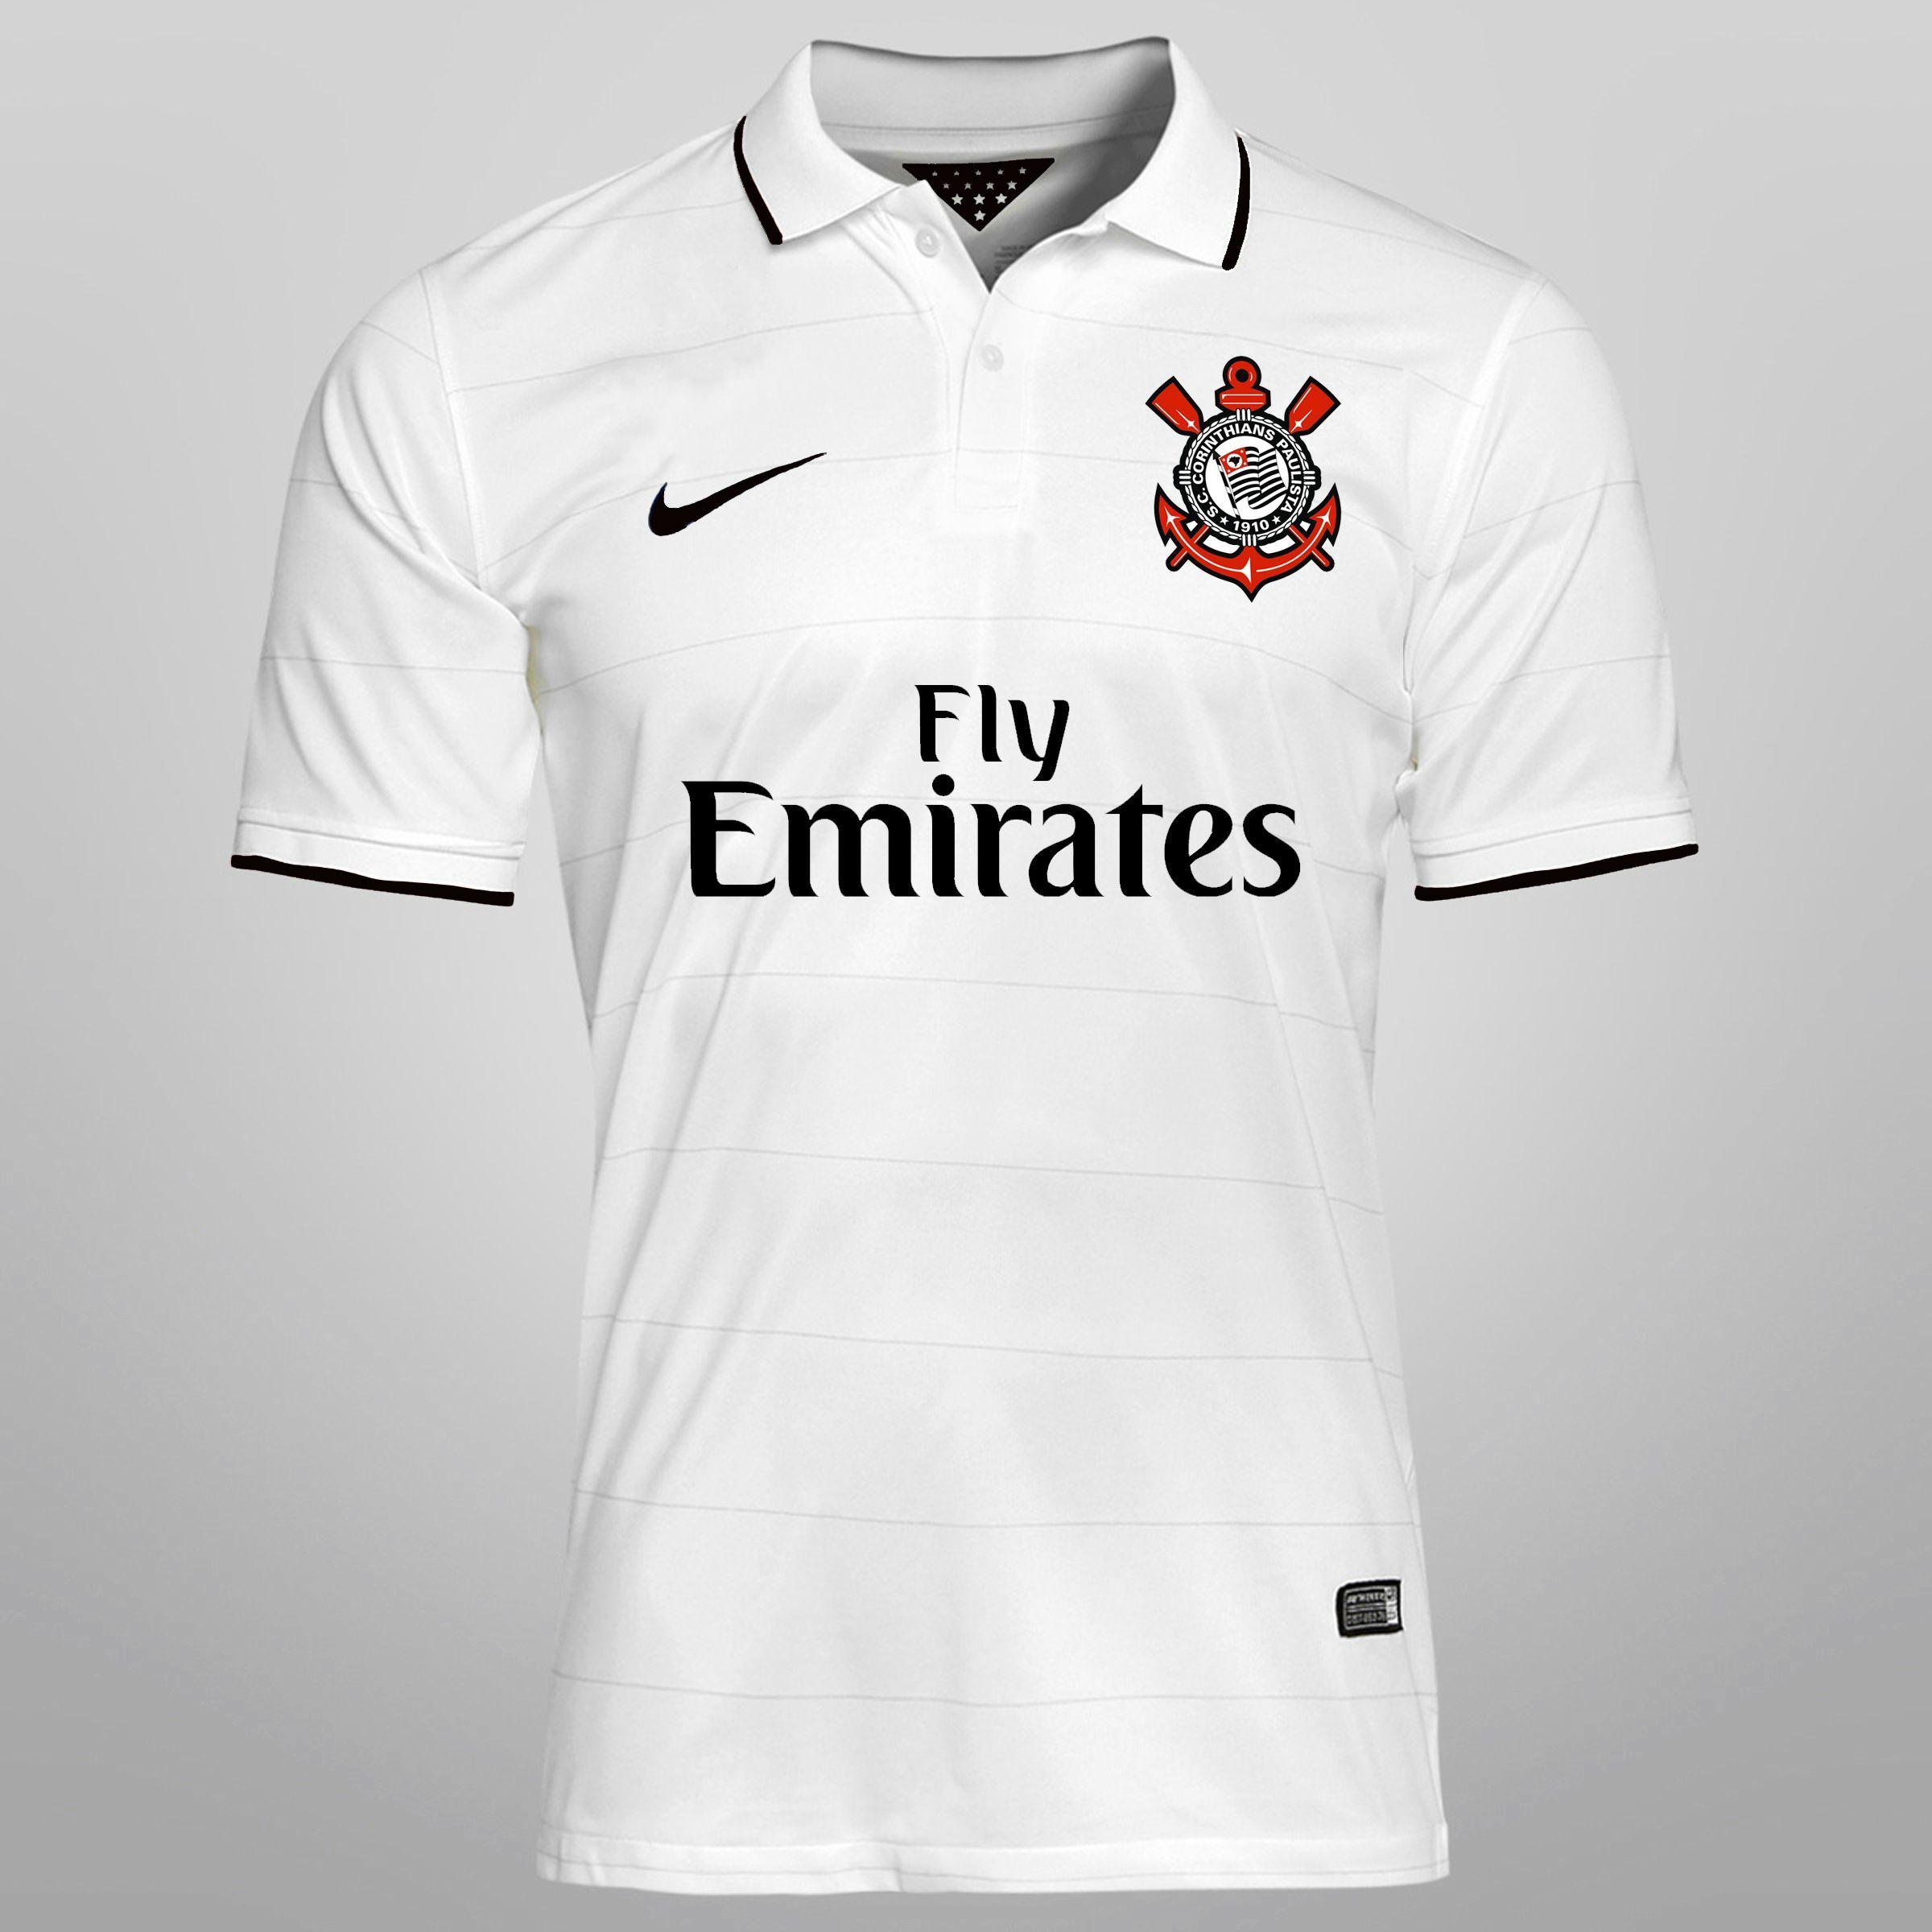 4550142b29471 Camisas do Corinthians 2014 15